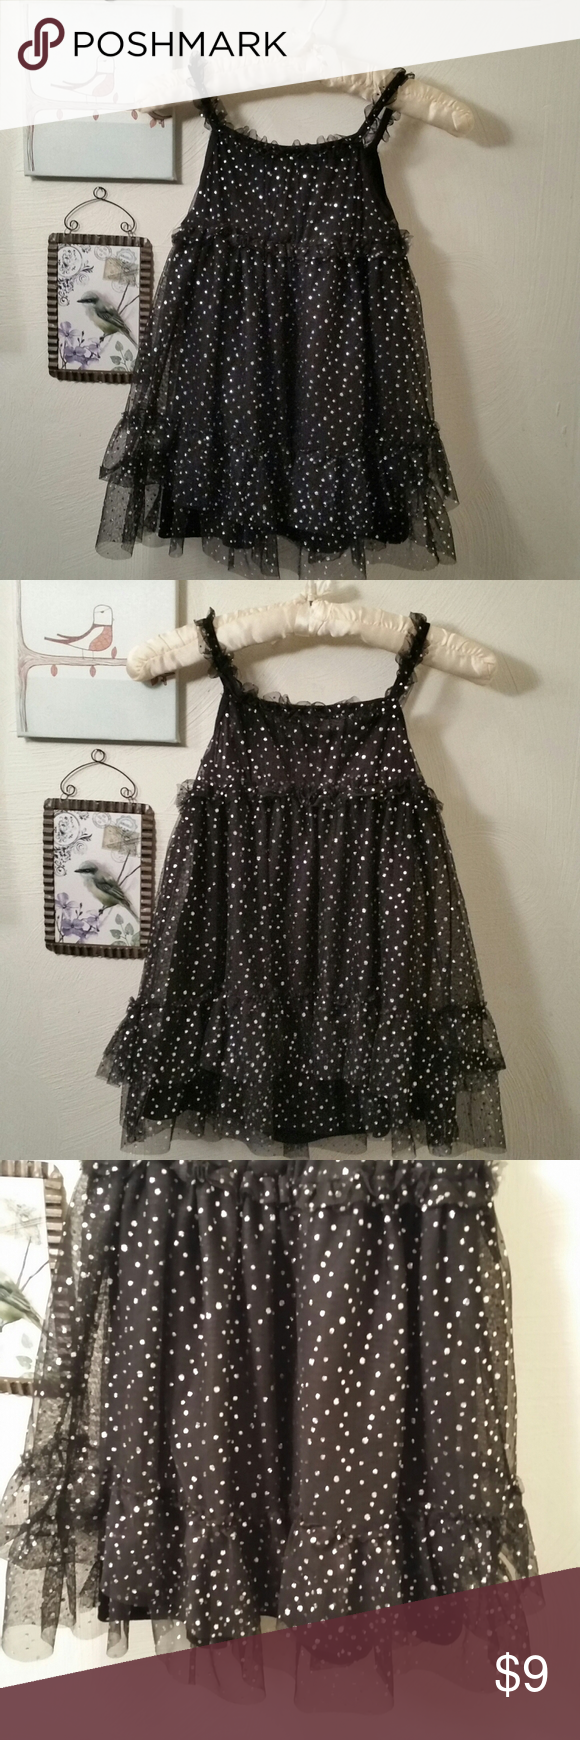 Dress Dsp 132 4t Black With Lace Sainal Jewelrytowearwithblackdressforwedding Black Dresses Classy Cocktail Dress Lace Black Cocktail Dress [ 1102 x 736 Pixel ]